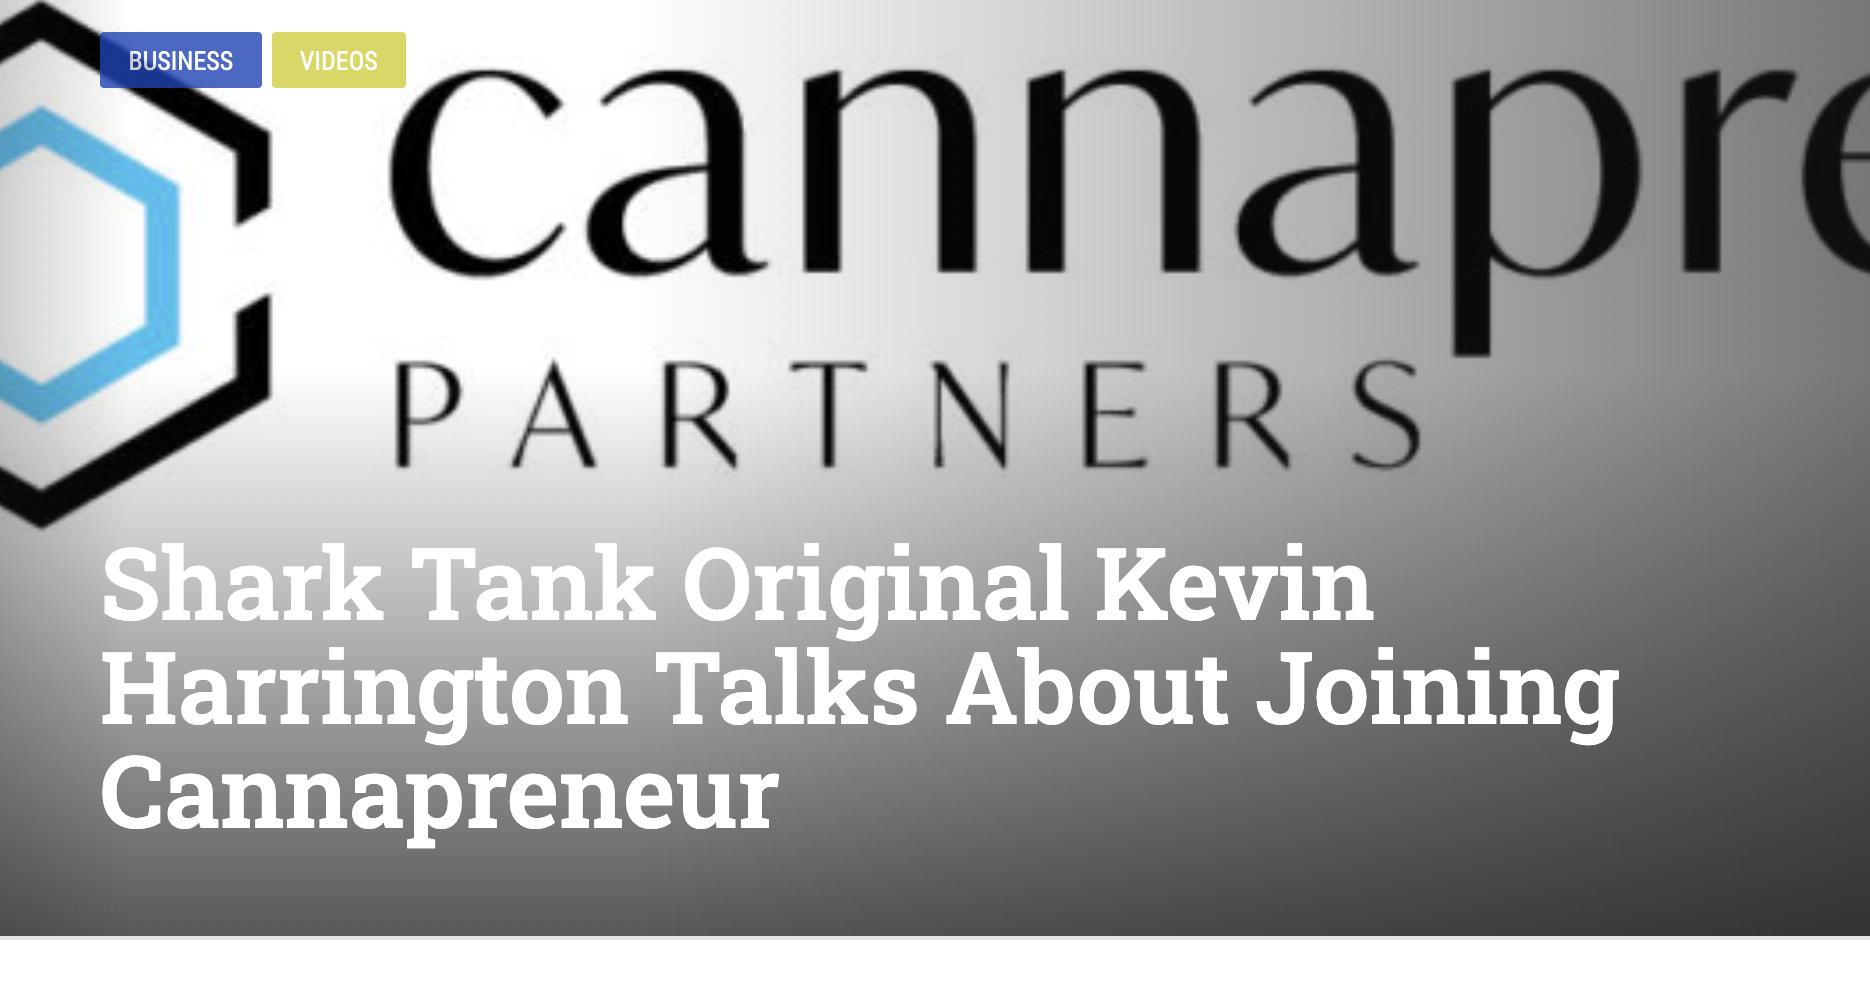 BUSINESSVIDEOS Shark Tank Original Kevin Harrington Talks About Joining Cannapreneur